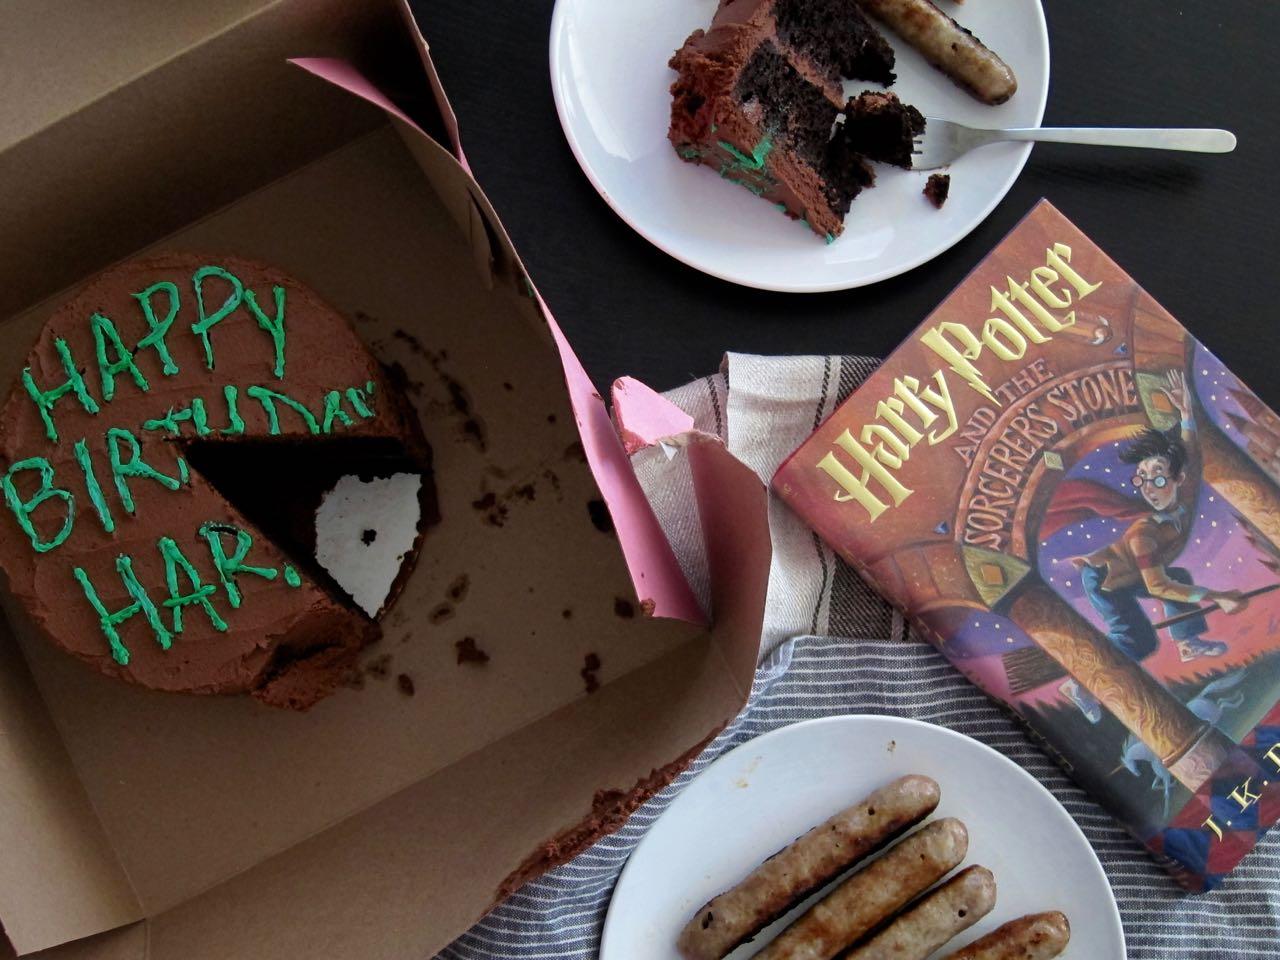 Happy Birthday Harry Chocolate Cake